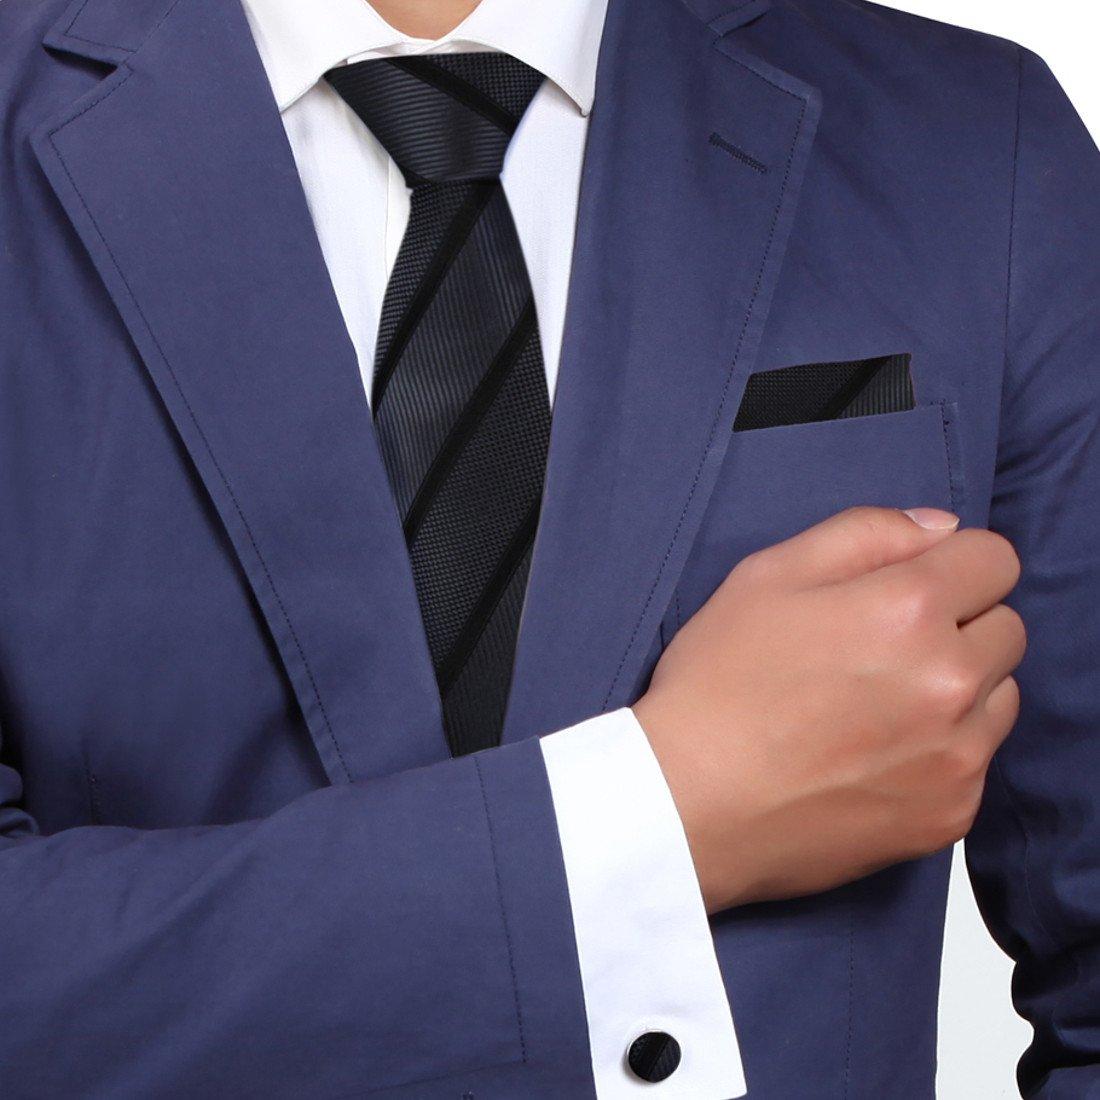 H7020 Cornflower Blue Stripes Great Shop Gift Items Mens Silk Tie 3PT By Y/&G